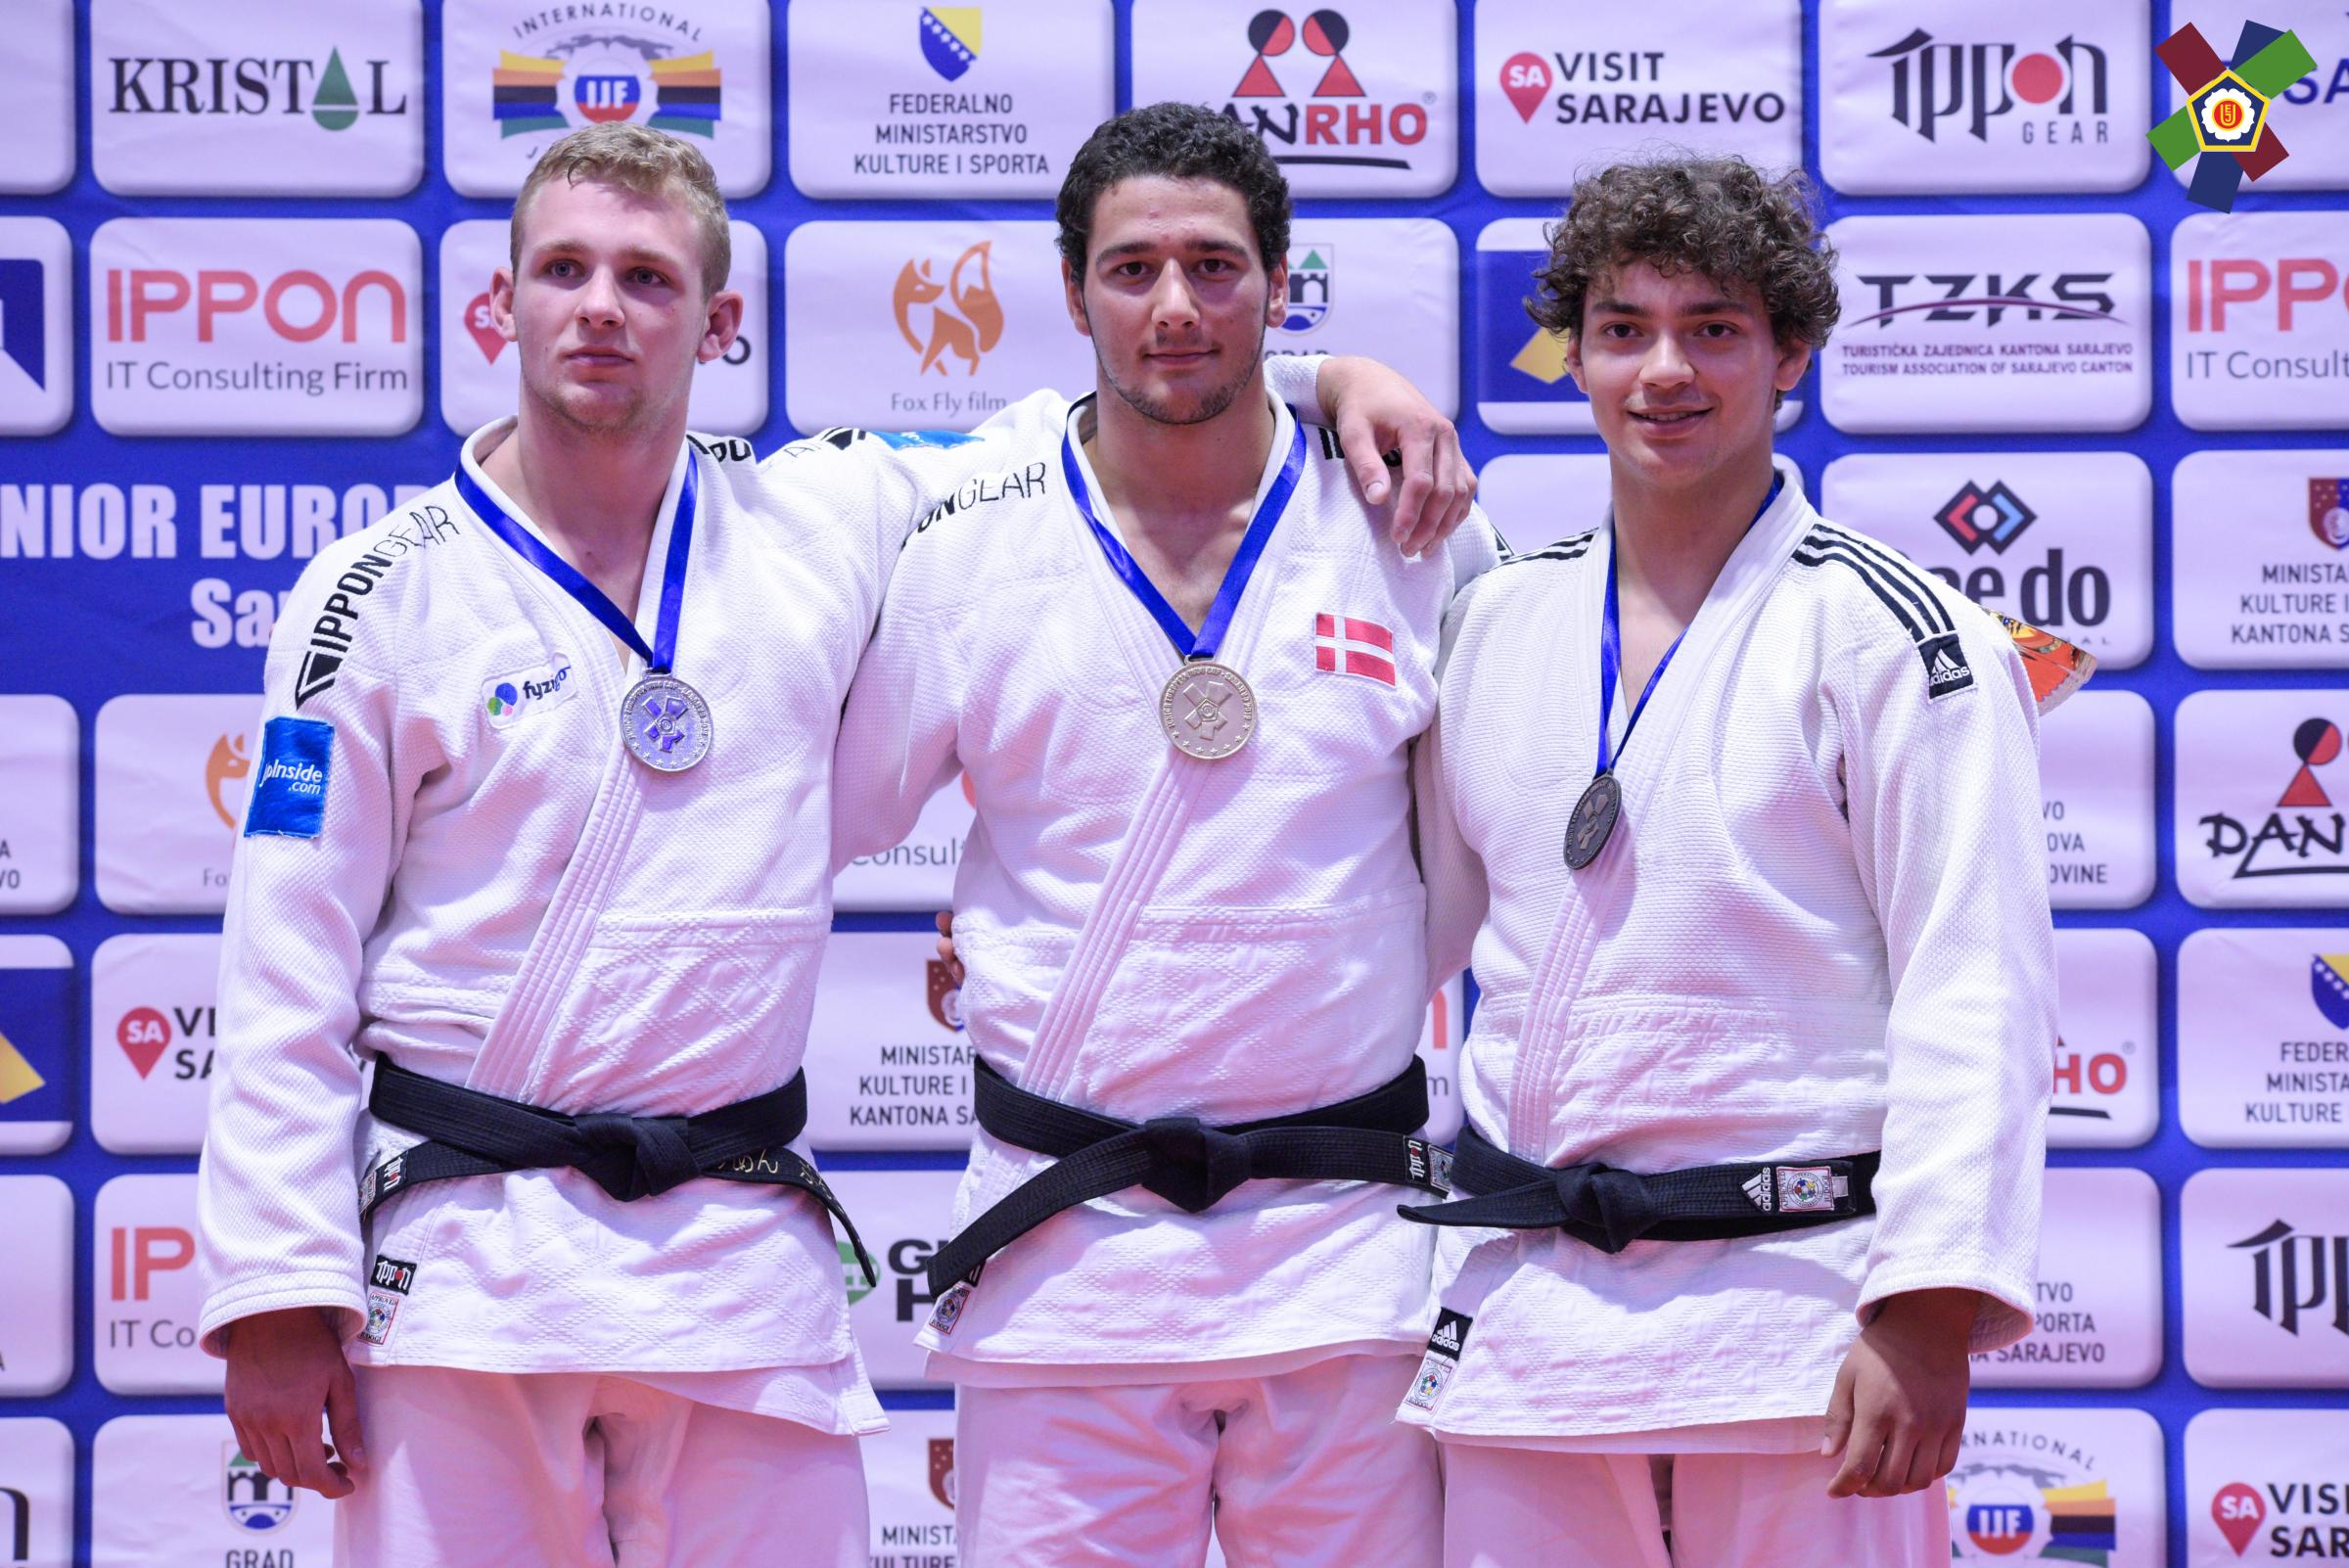 EJU-European-Junior-Cup-Sarajevo-2019-Madsen-Bulthuis-1